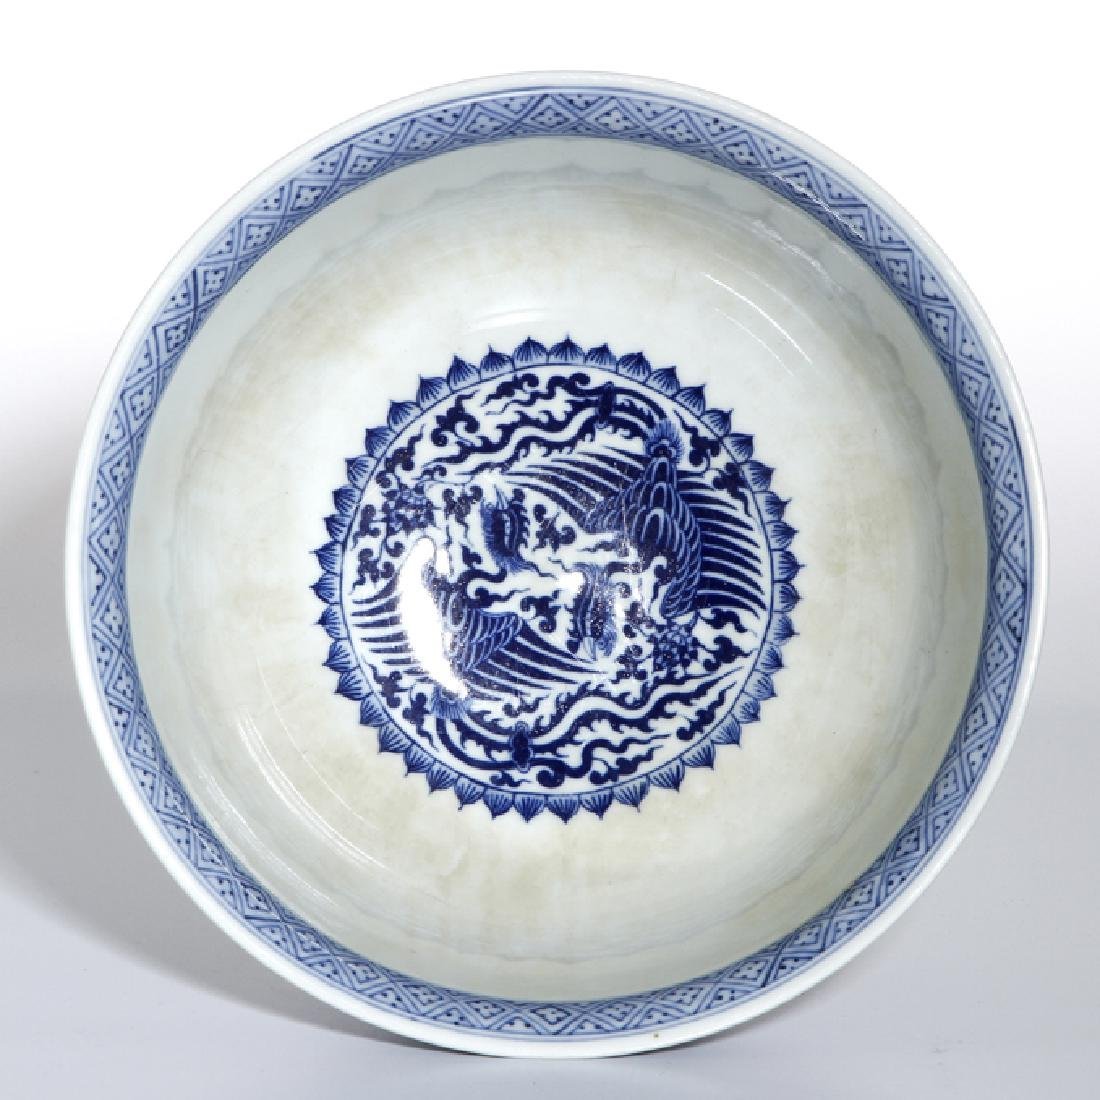 Chinese Blue and White 'Phoenix Medallion' Bowl - 5